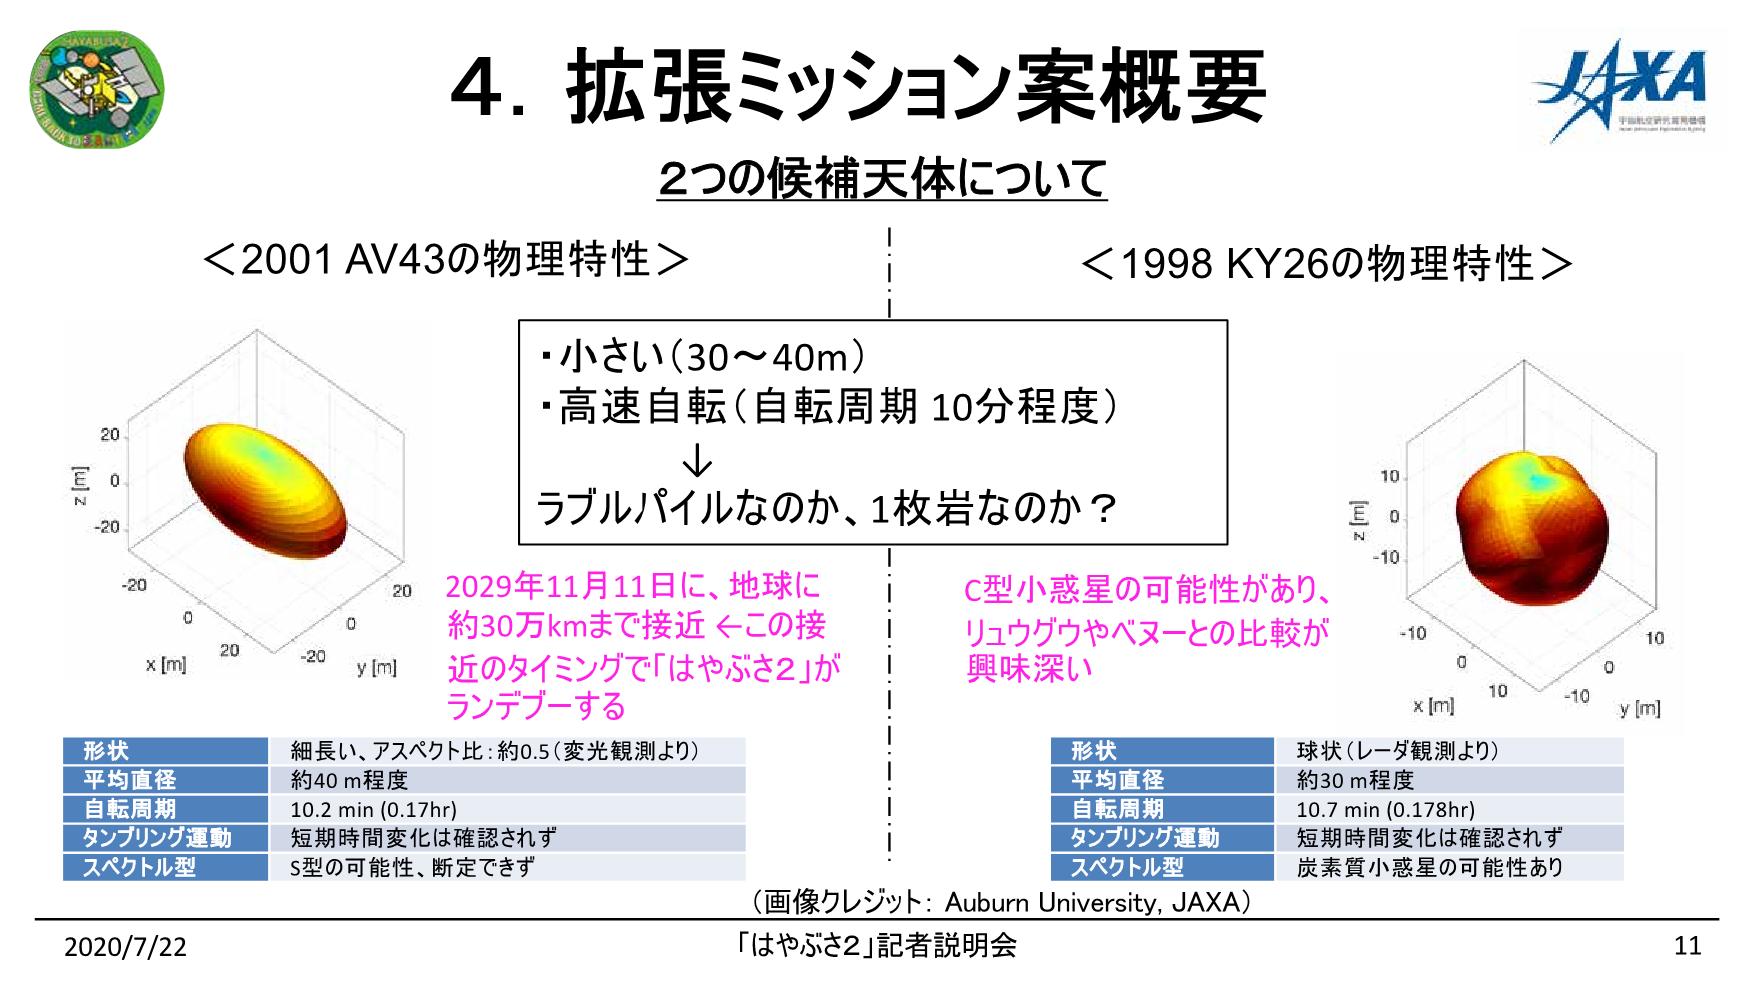 f:id:Imamura:20200722140715p:plain